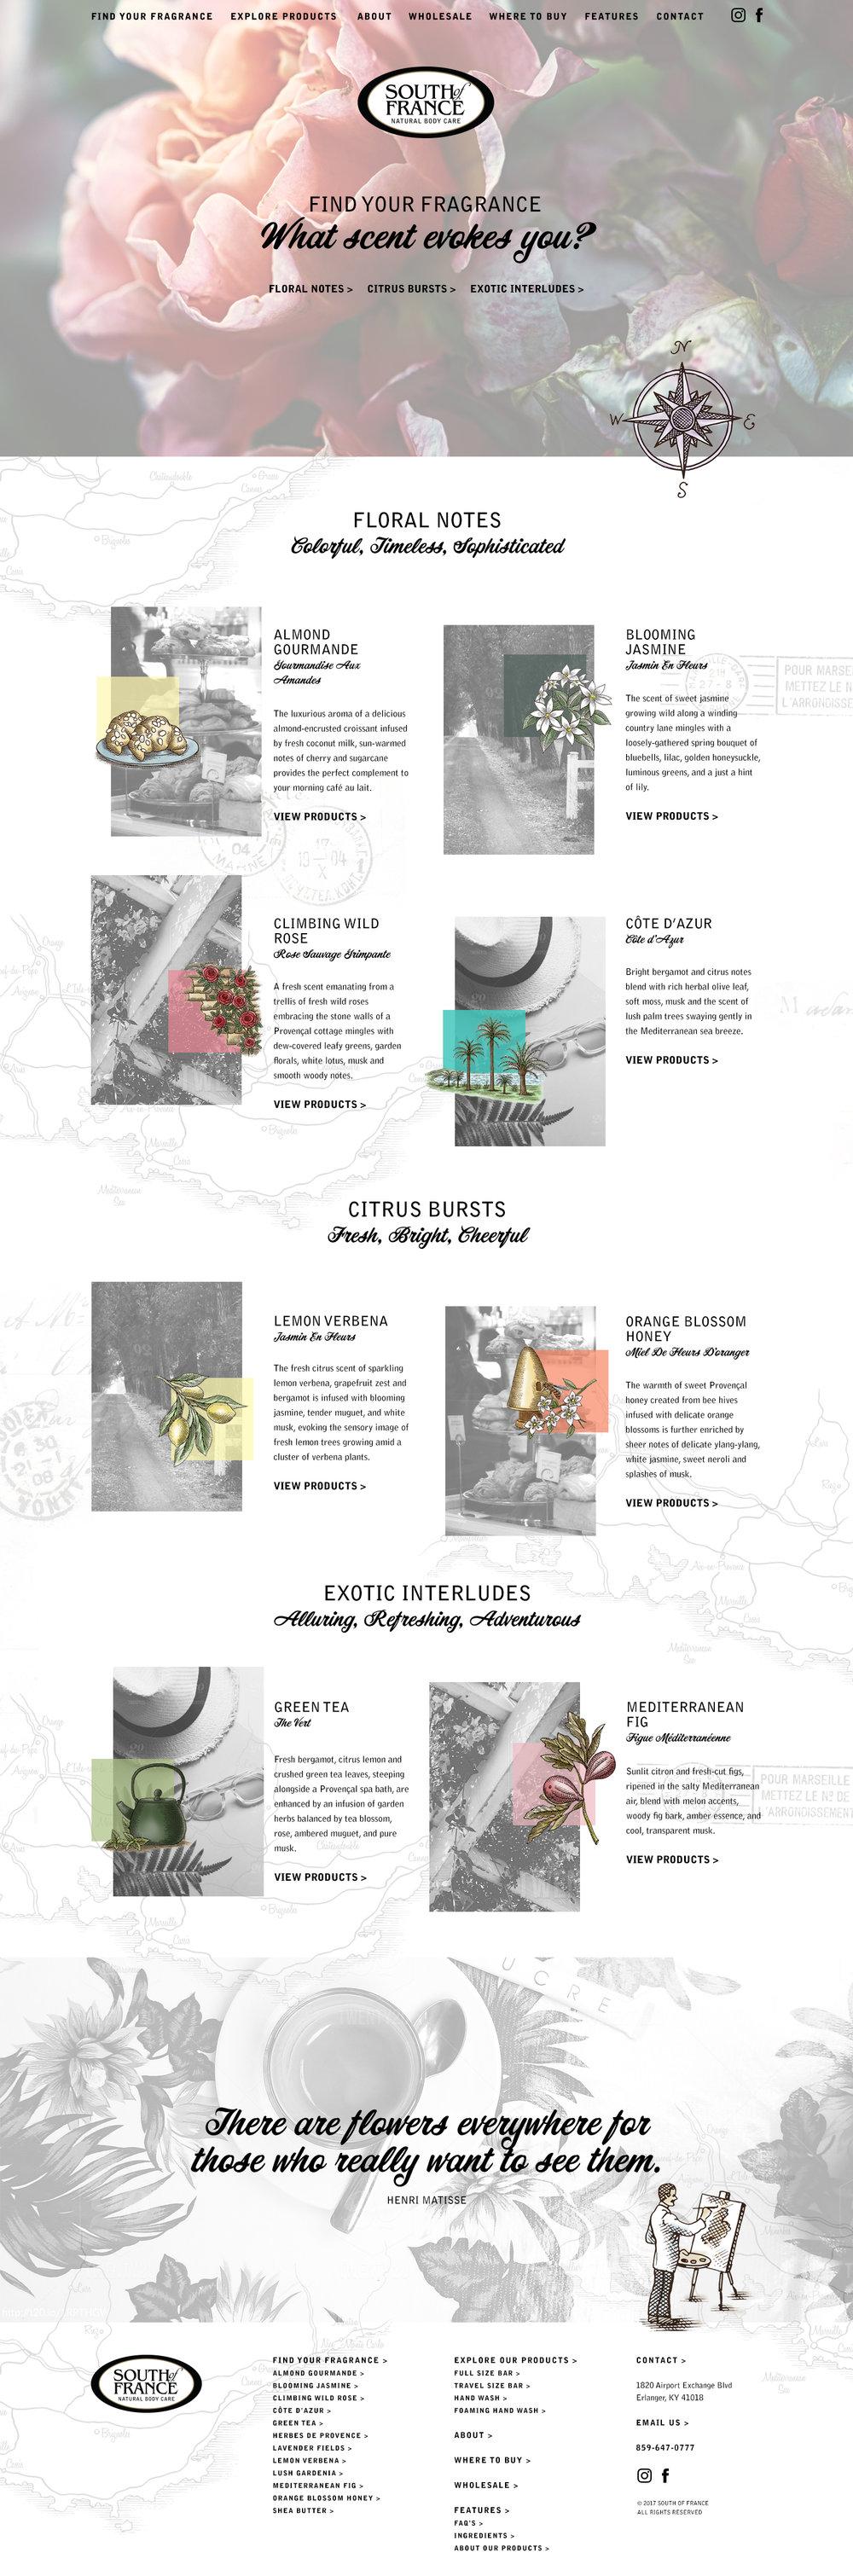 SOF-Find-Your-Fragrance.jpg